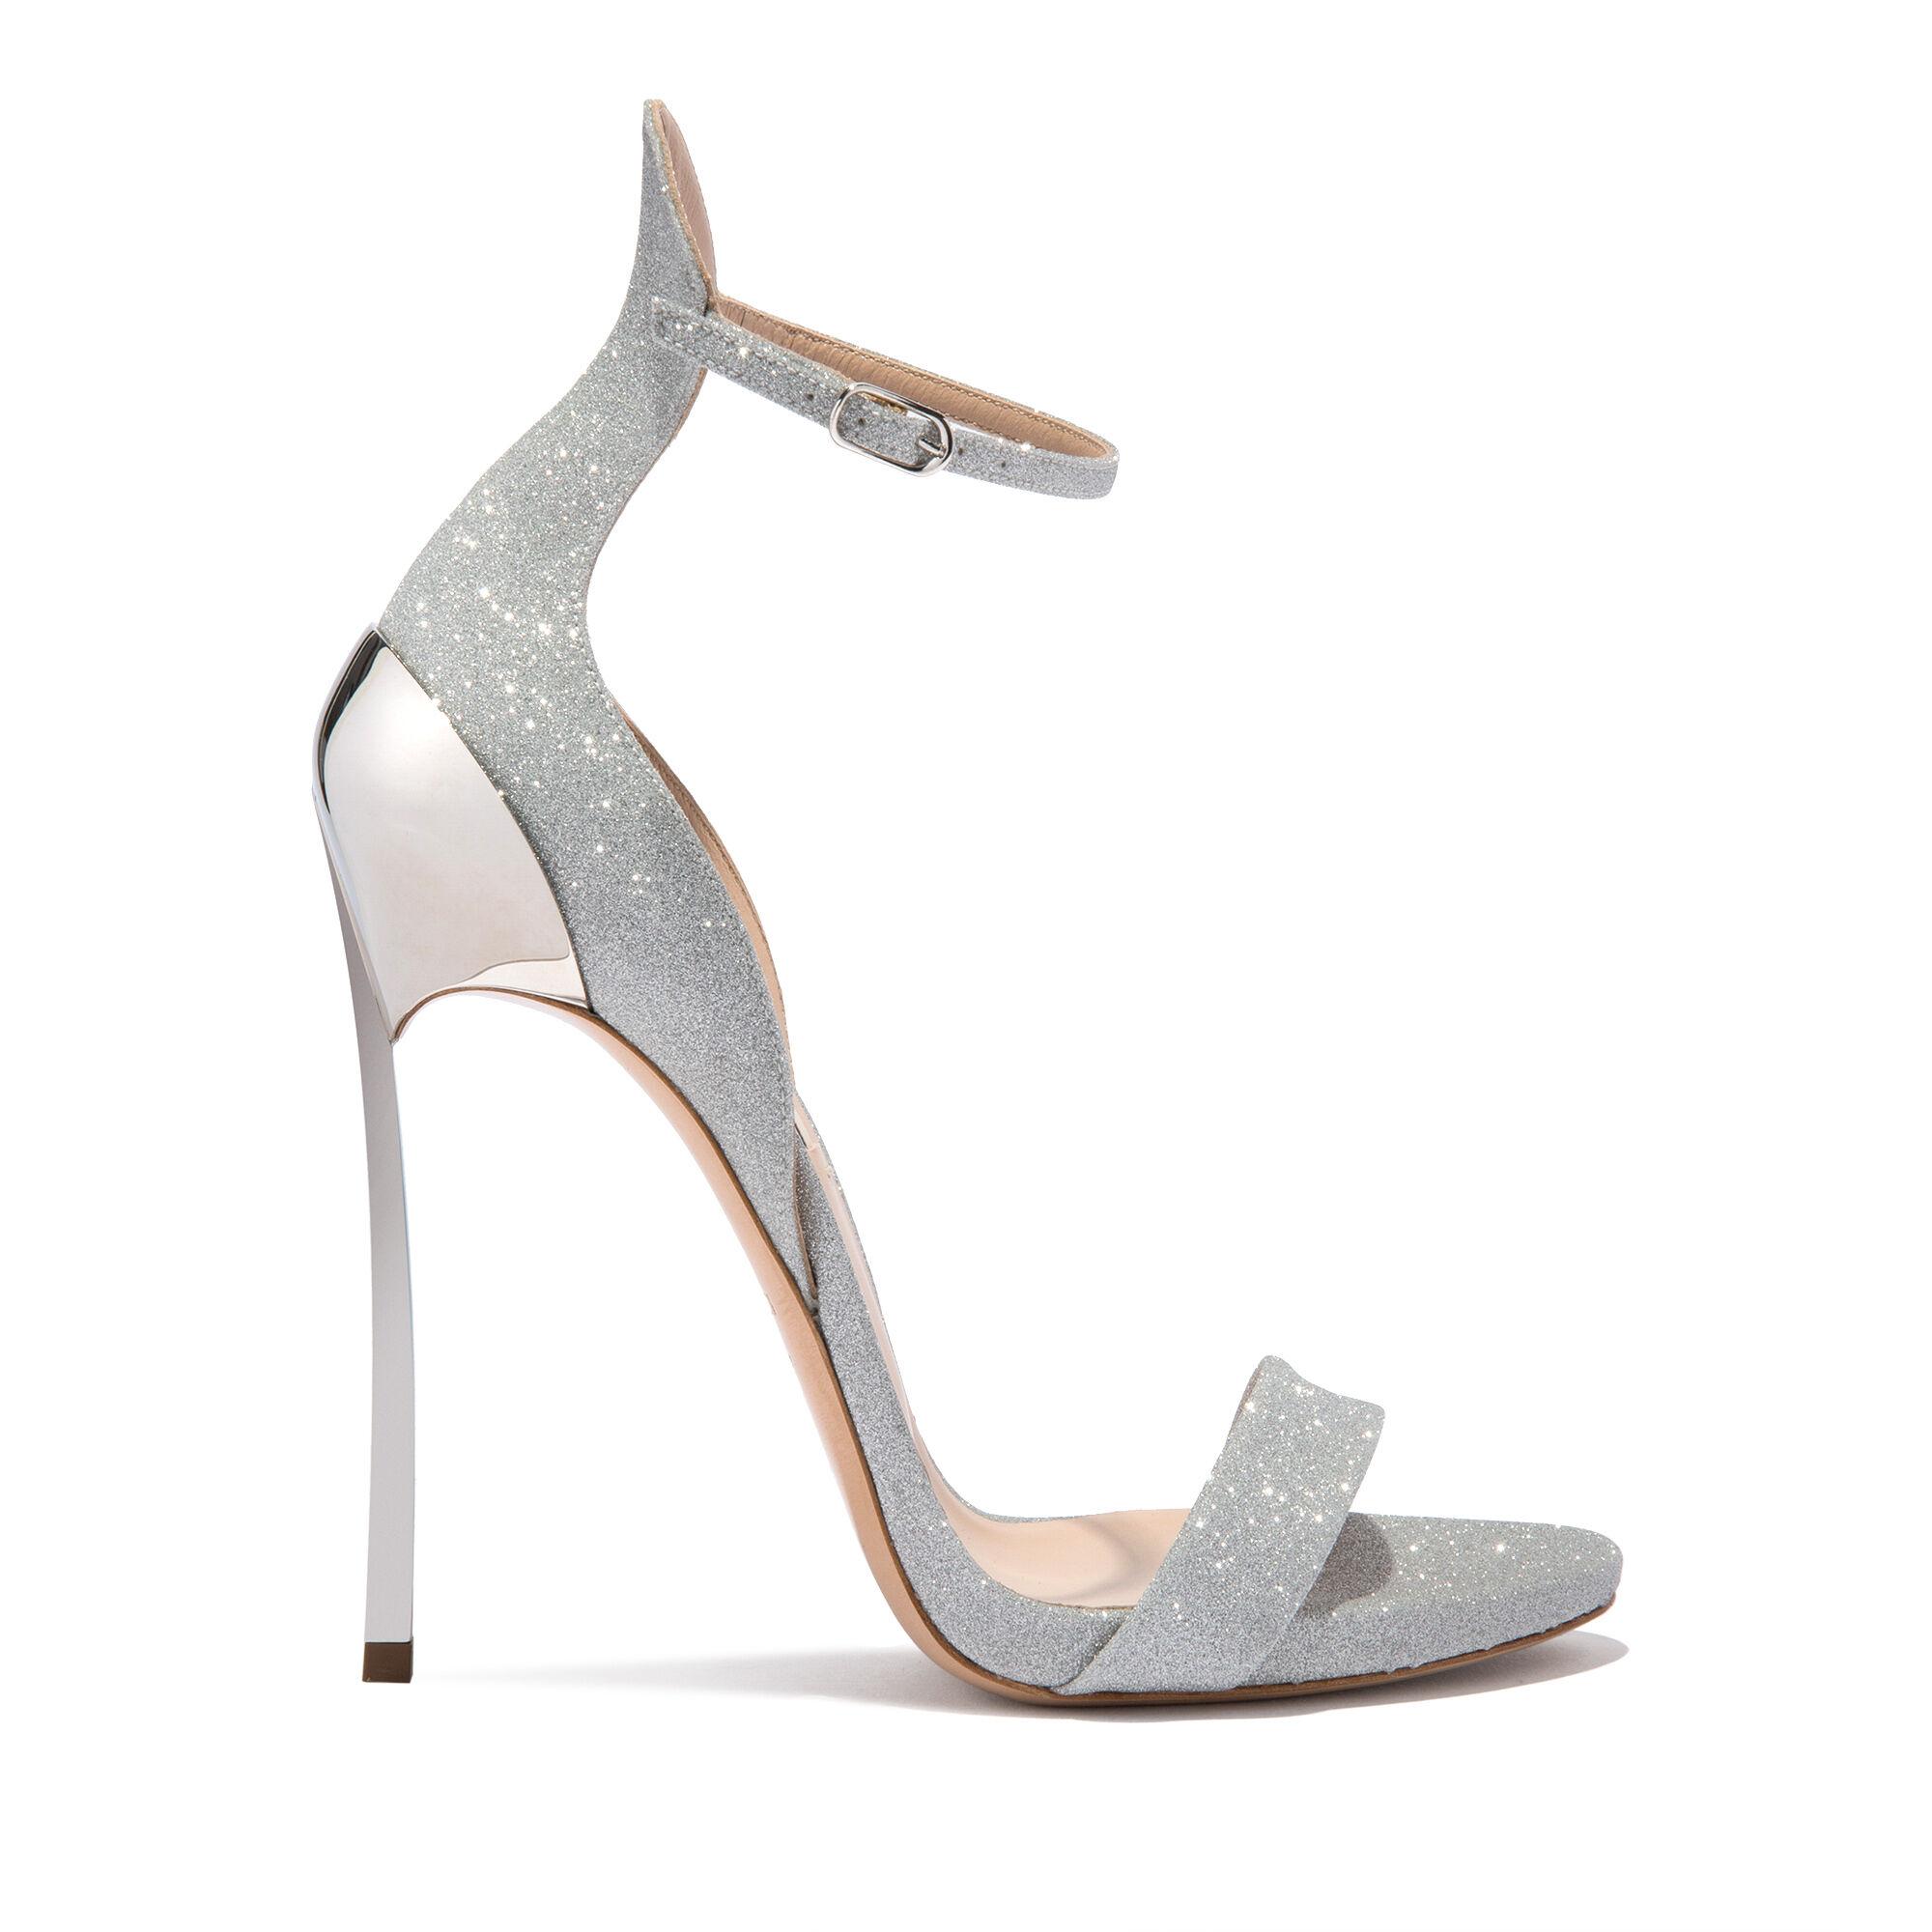 Designer Cappa Casadei SandalsTechno Women's Blade vNn0wm8O